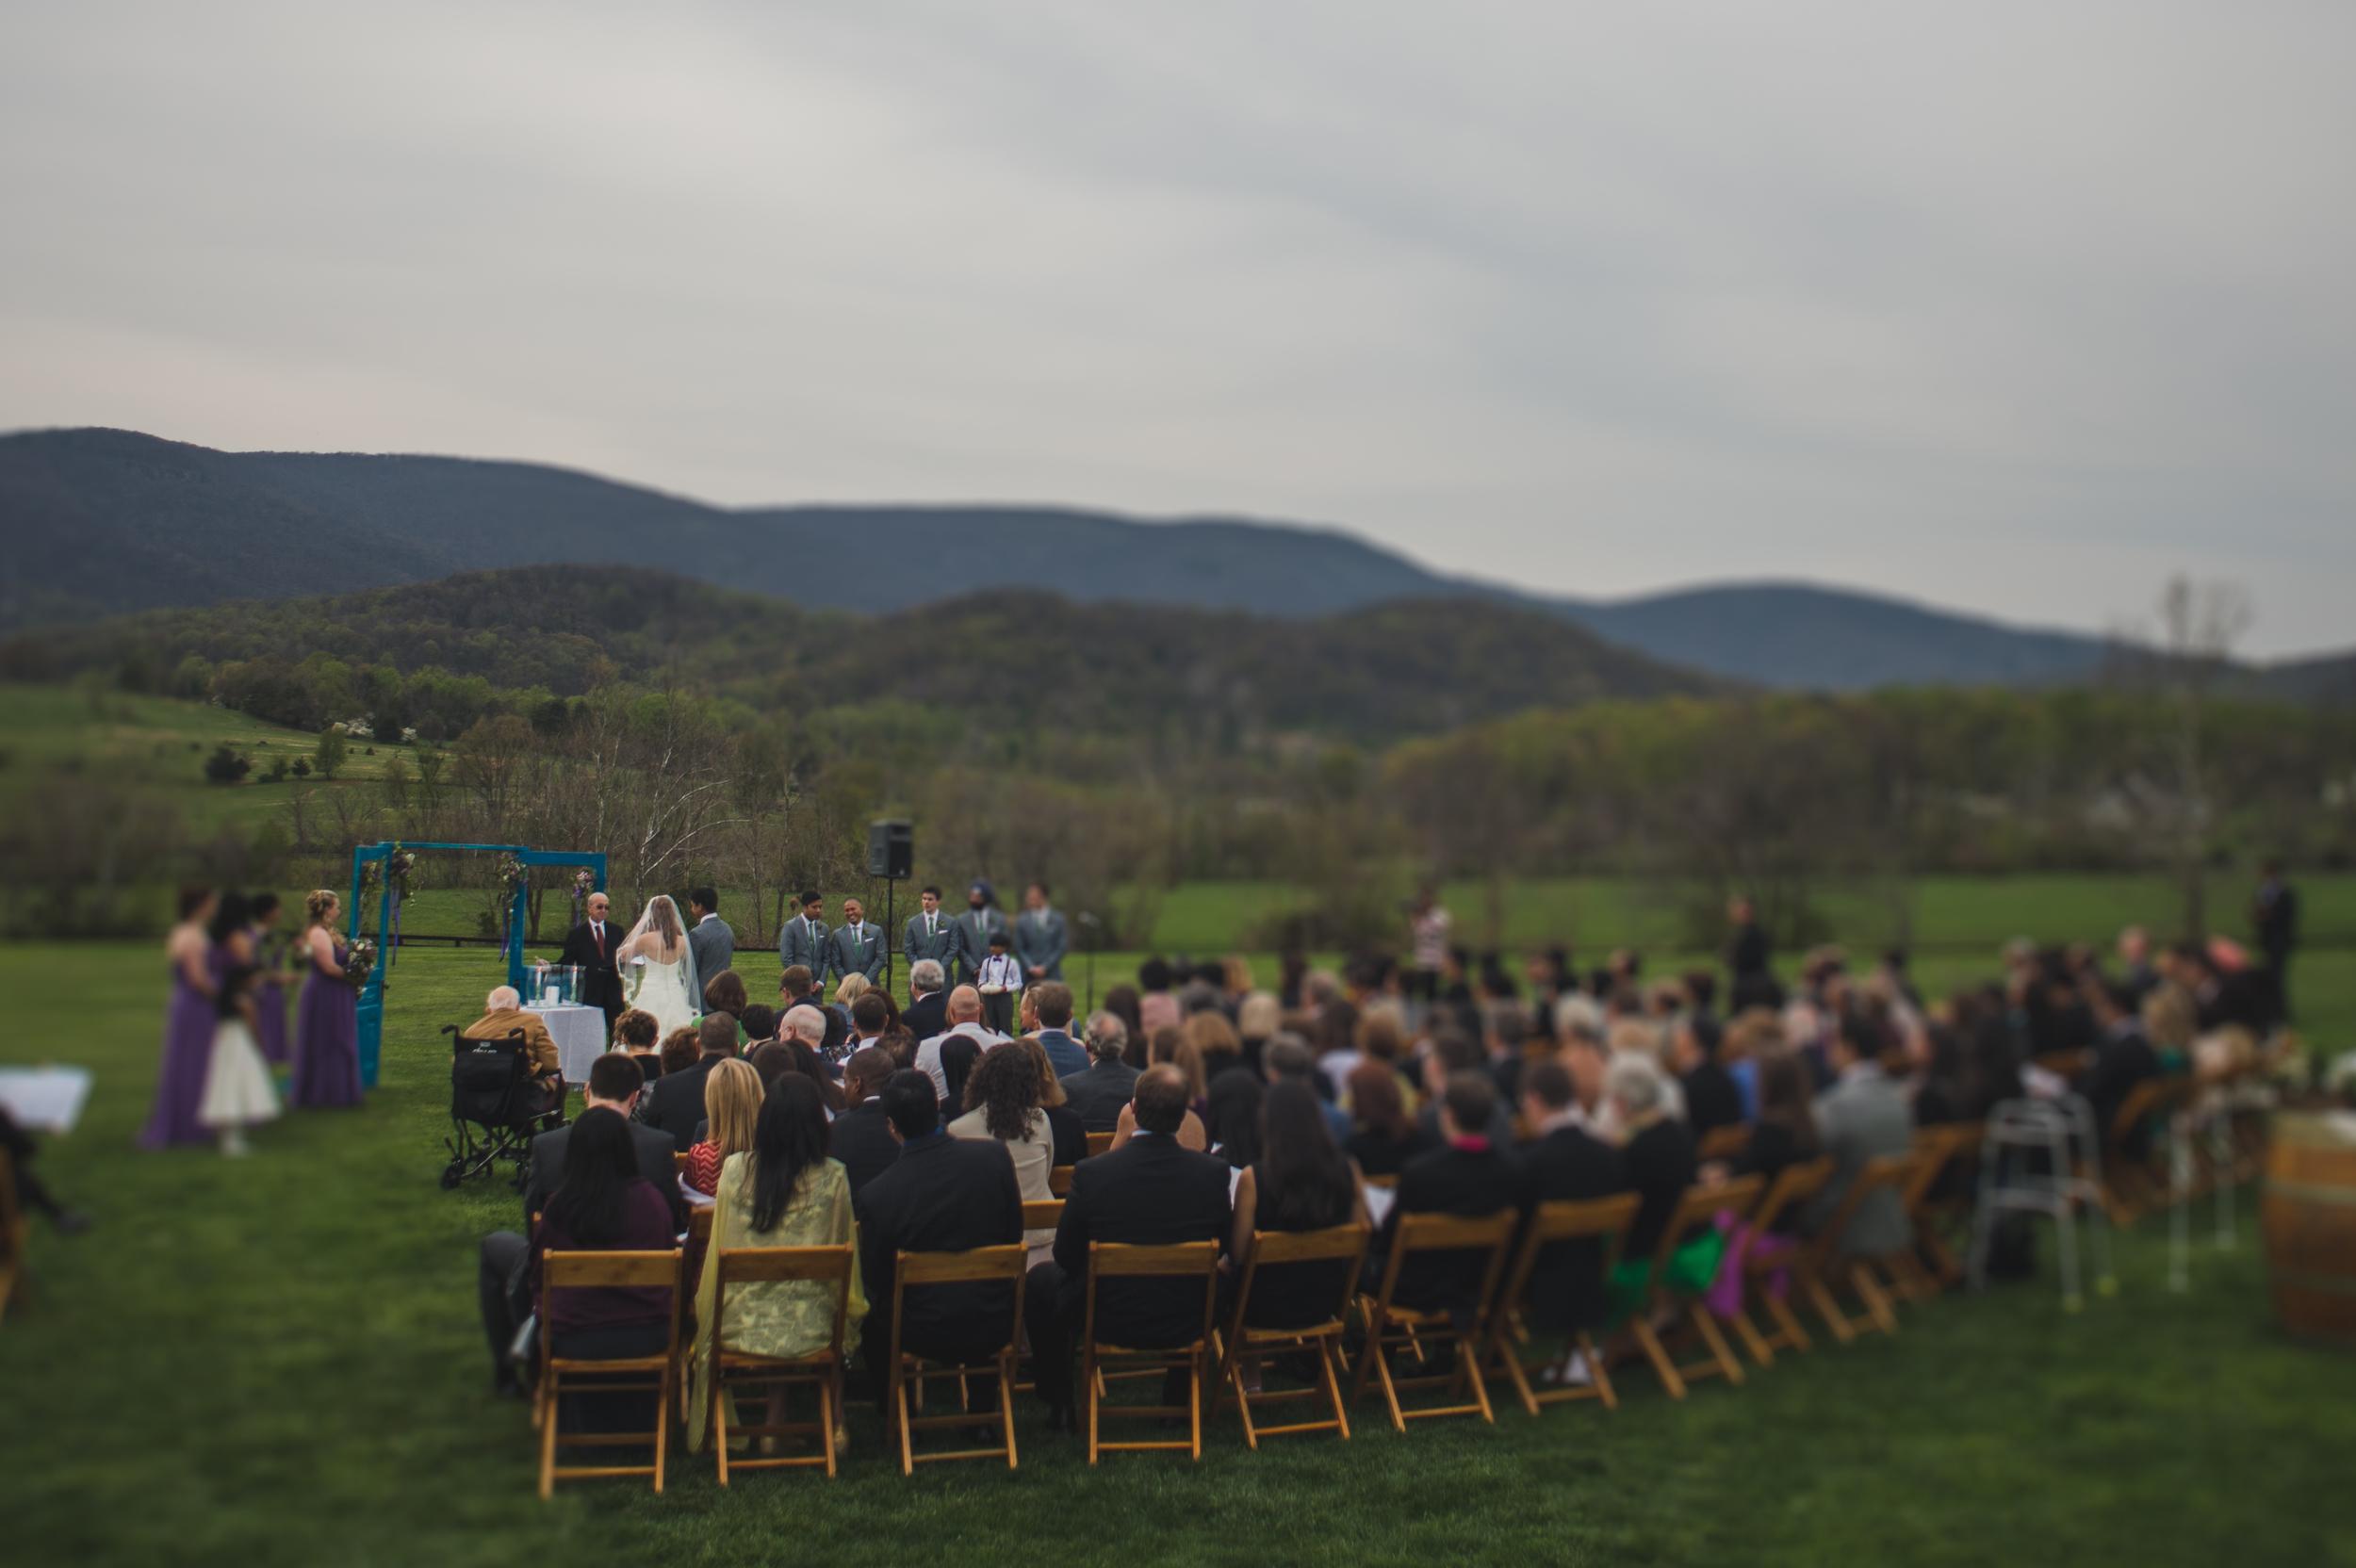 Photojournalistic wedding photography Baltimore MD By Mantas Kubilinskas-19.jpg